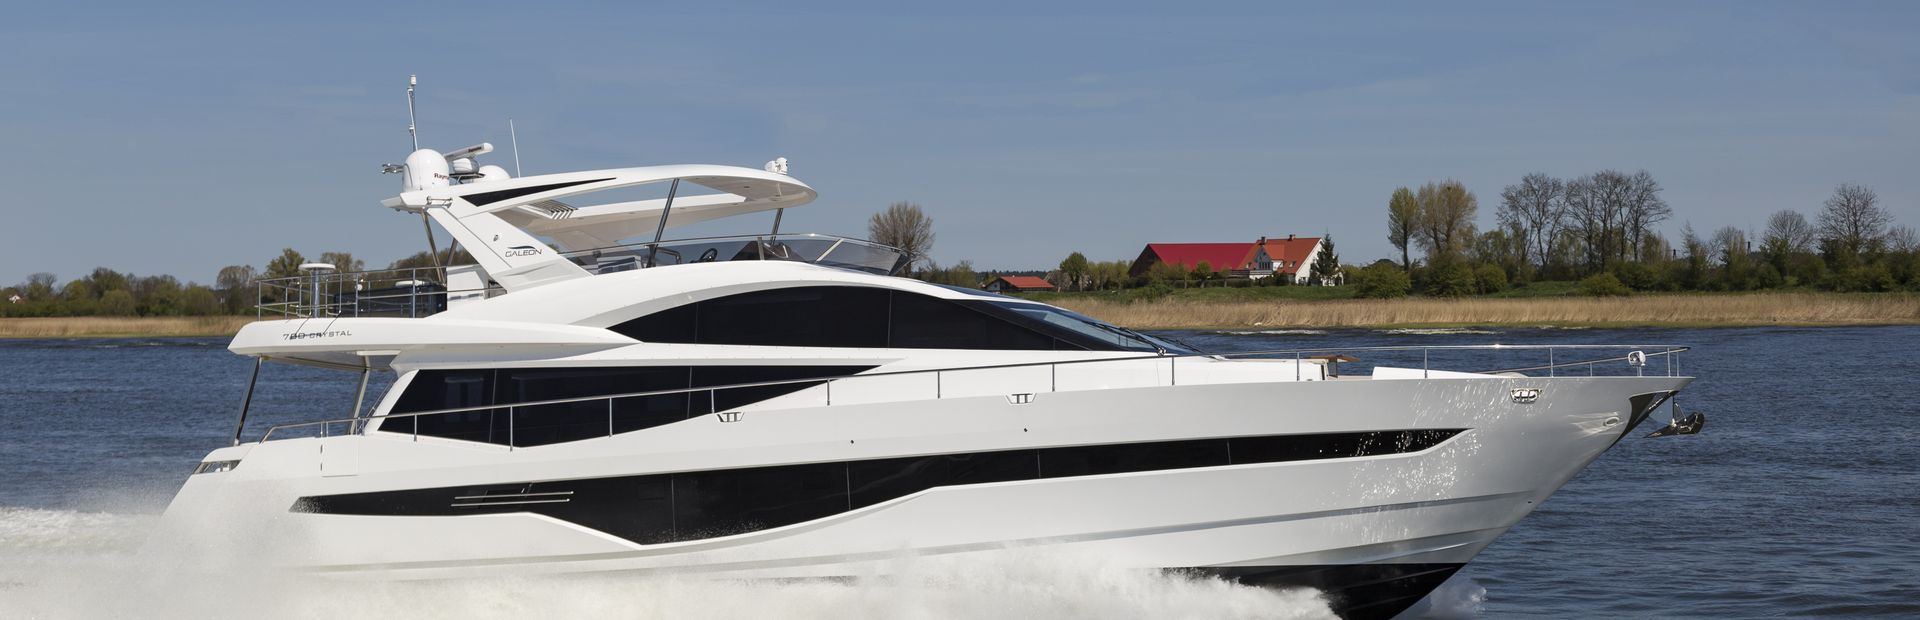 780 Crystal Yacht Charter